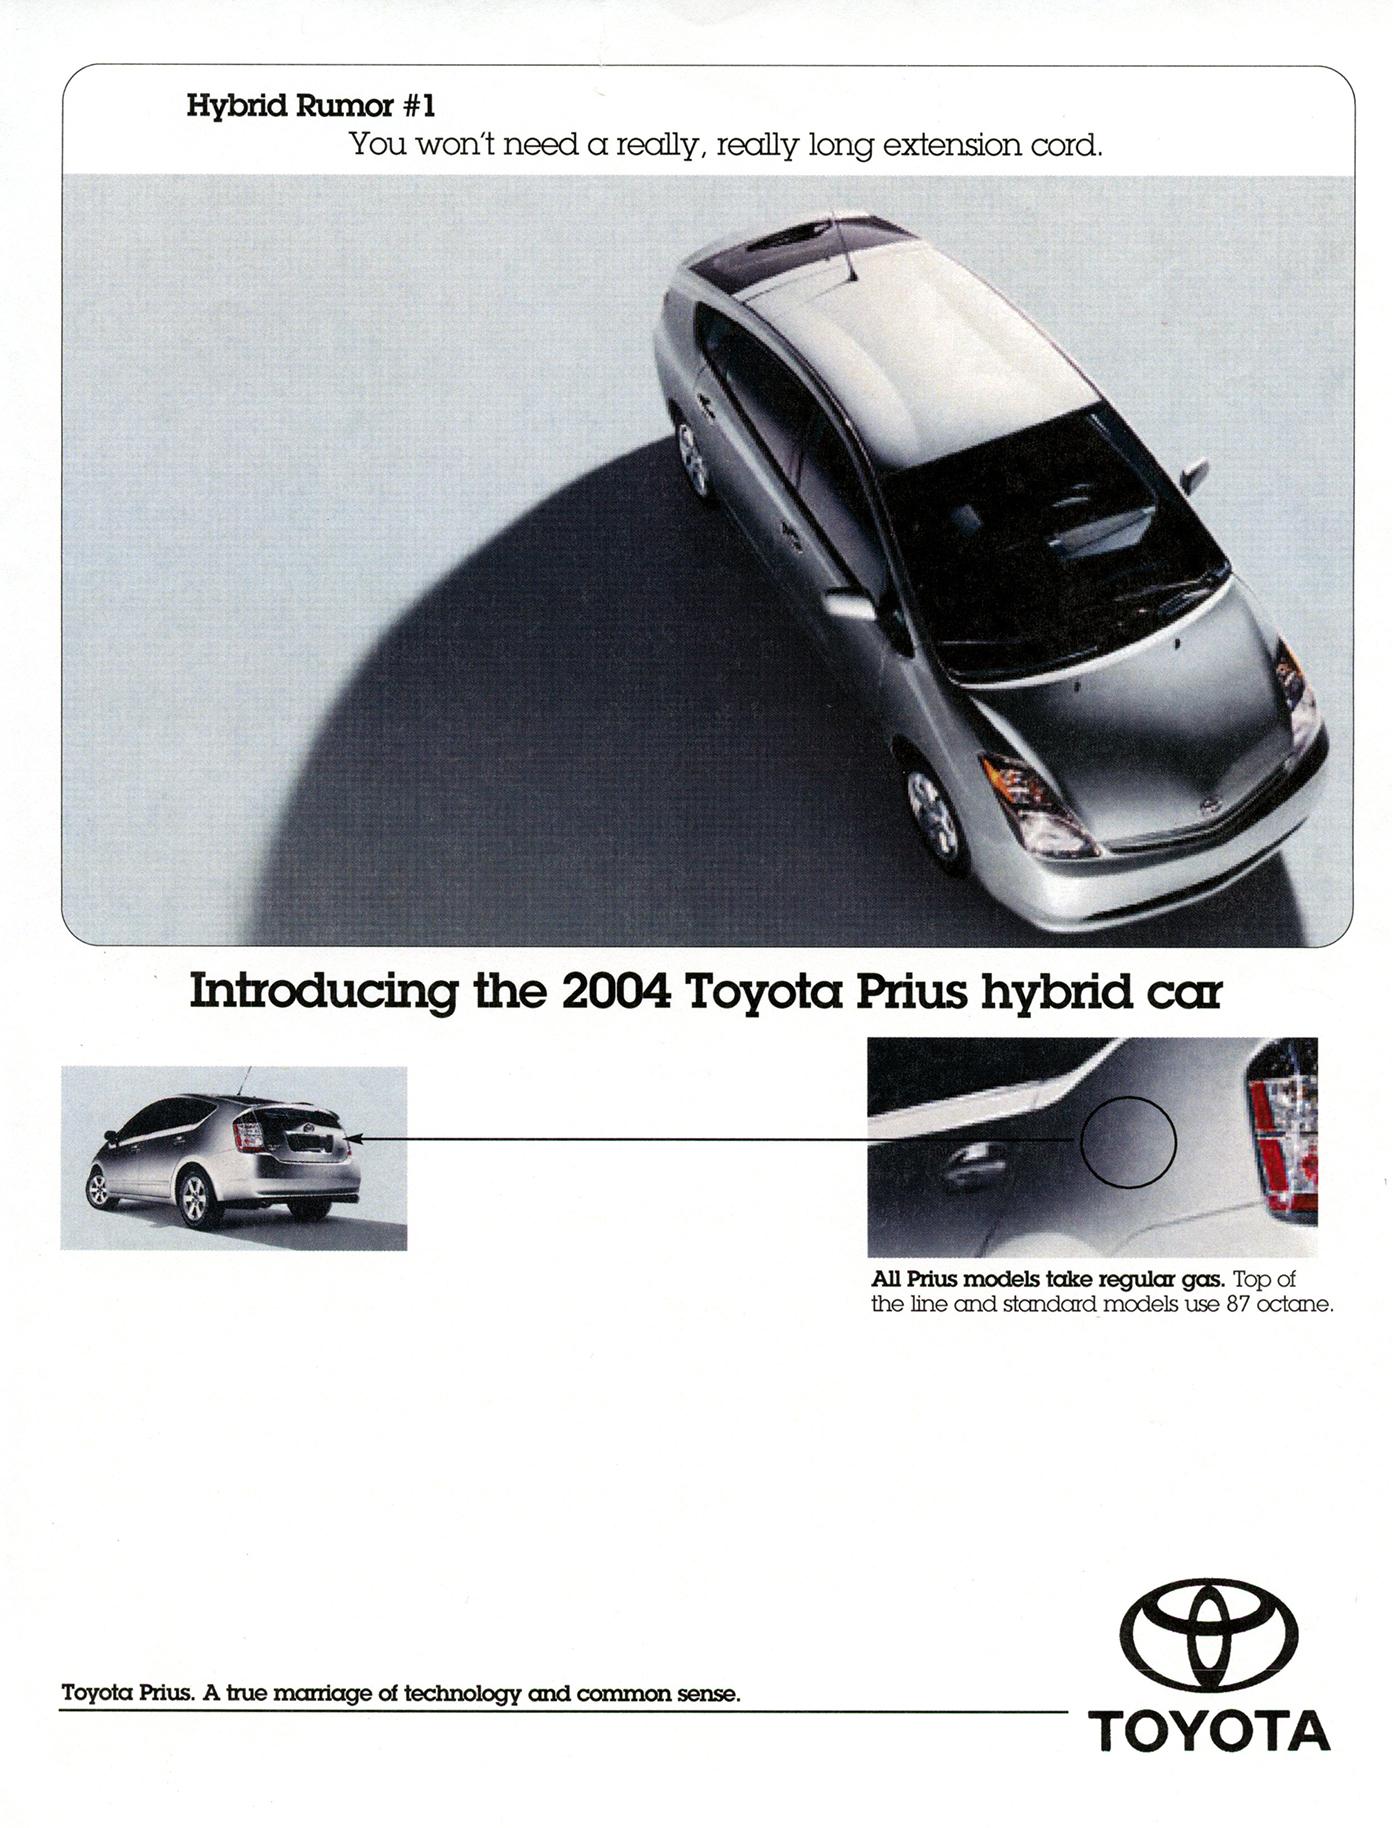 toyota prius advertisement